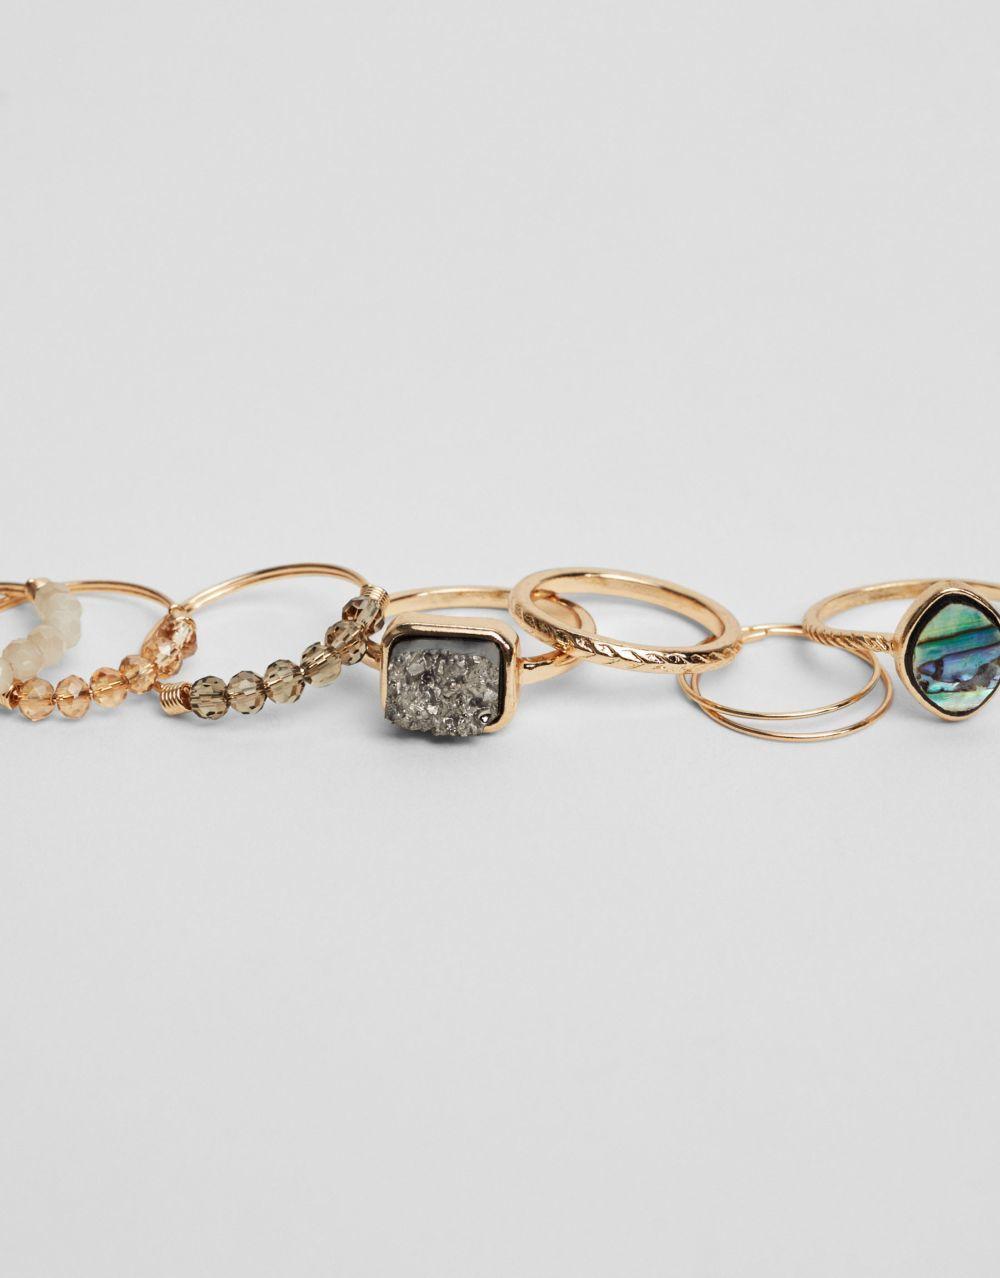 Pack anillos variados, De Pull&Bear (5,99 euros).